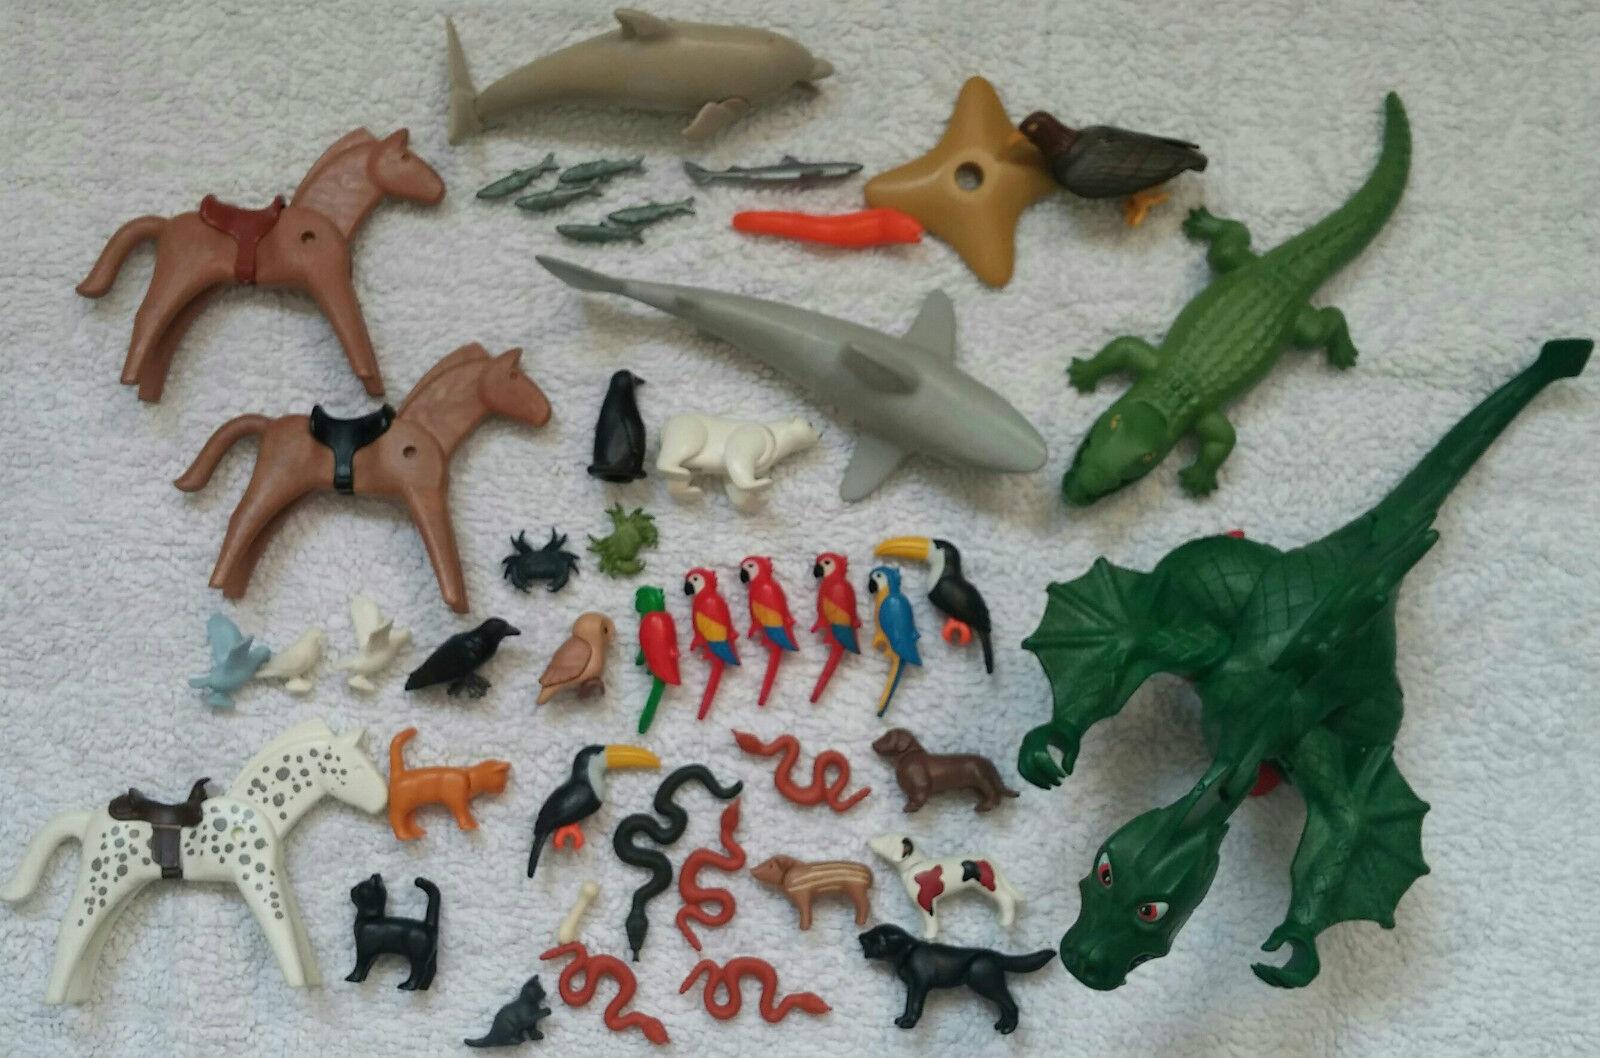 PLAYMOBIL 42 Tiere (Hai, Krokodil, Pferde, Vogel uvm) + Drache   Gebraucht  used